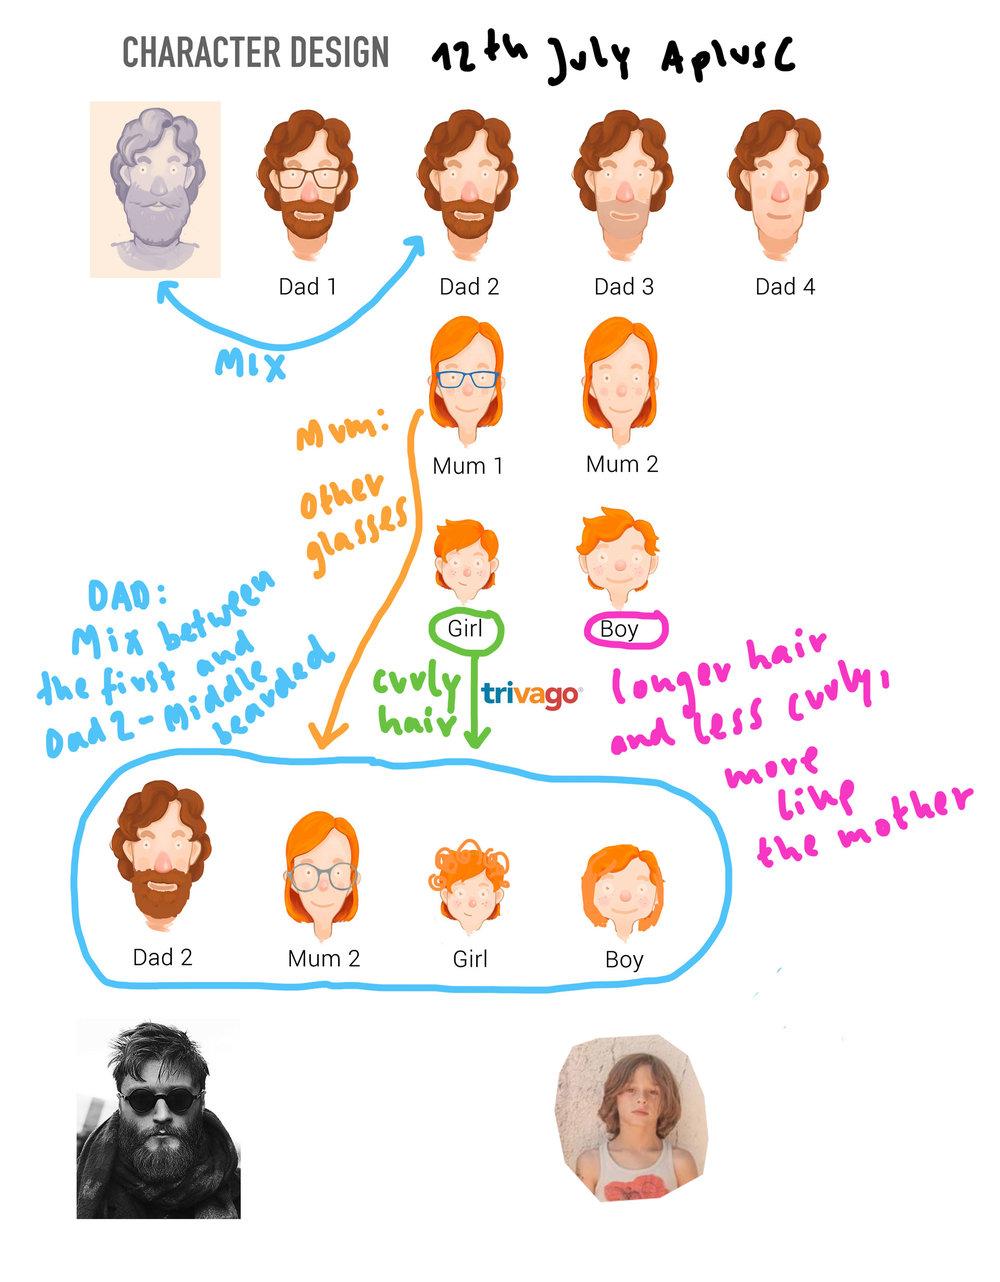 Characterdesign_feedback_BRITT.jpg